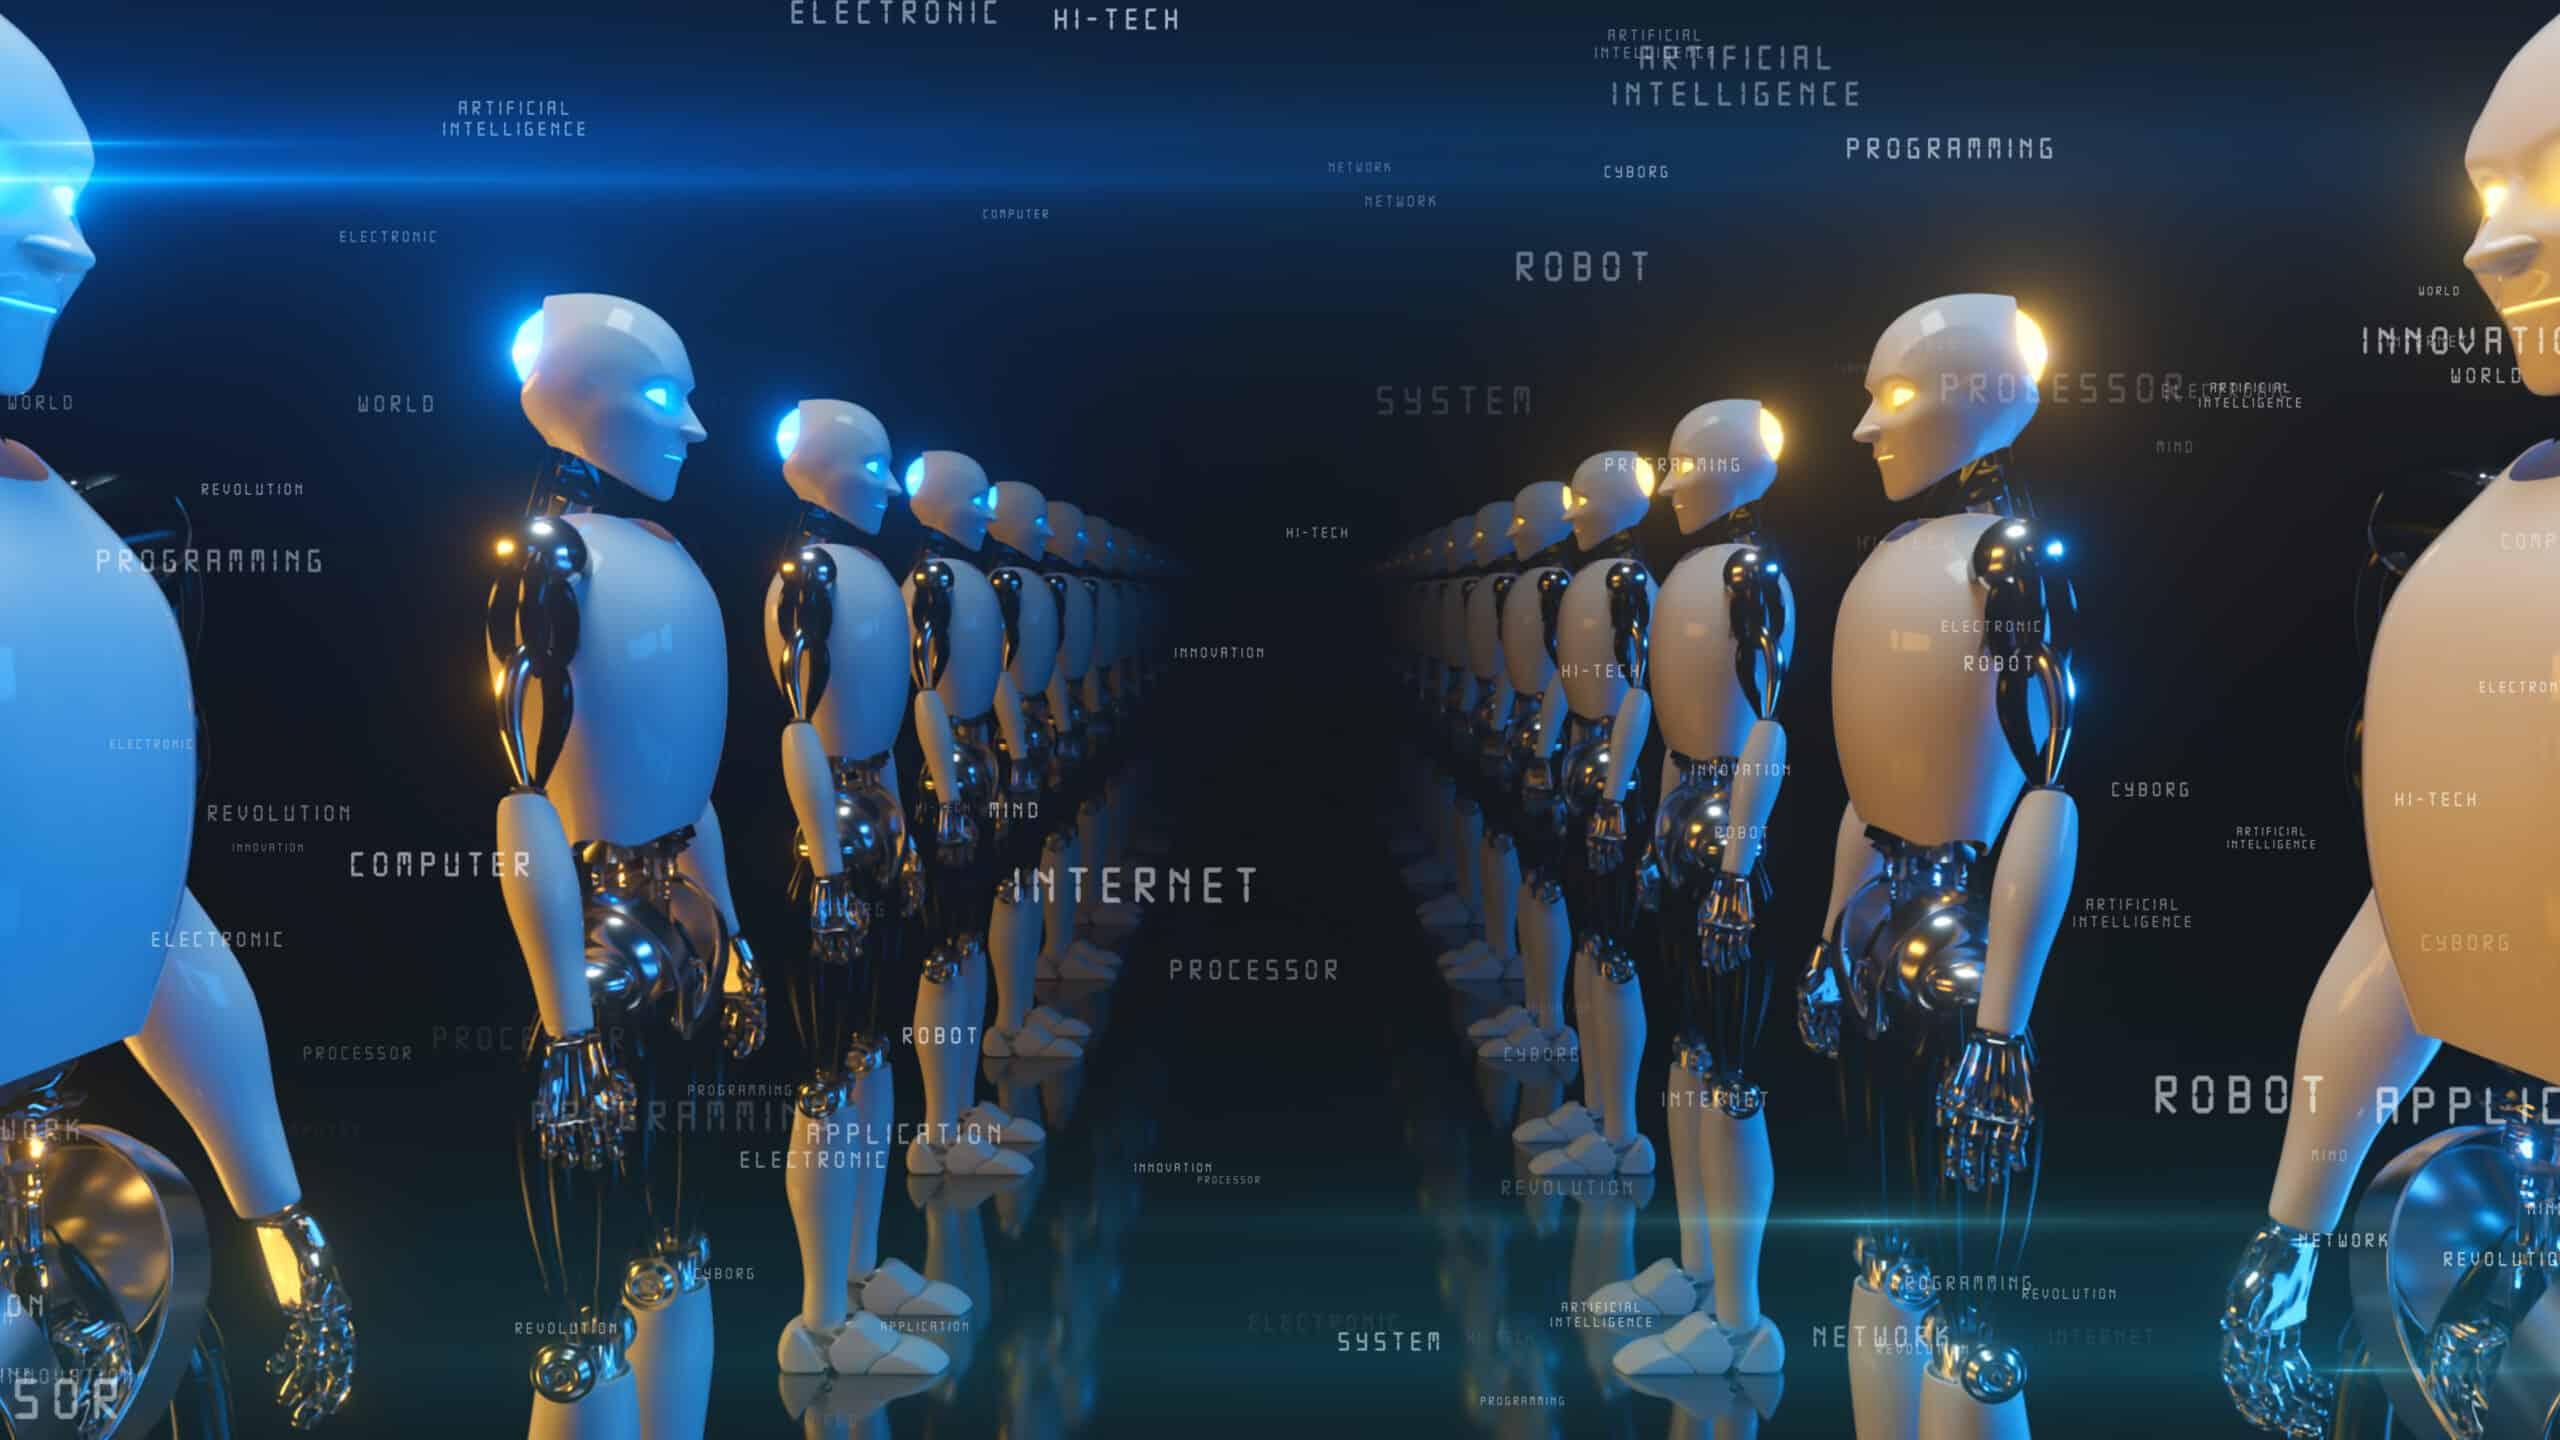 Robotics, Robot vision, Robot sound, Robot action, Robotic vision sound